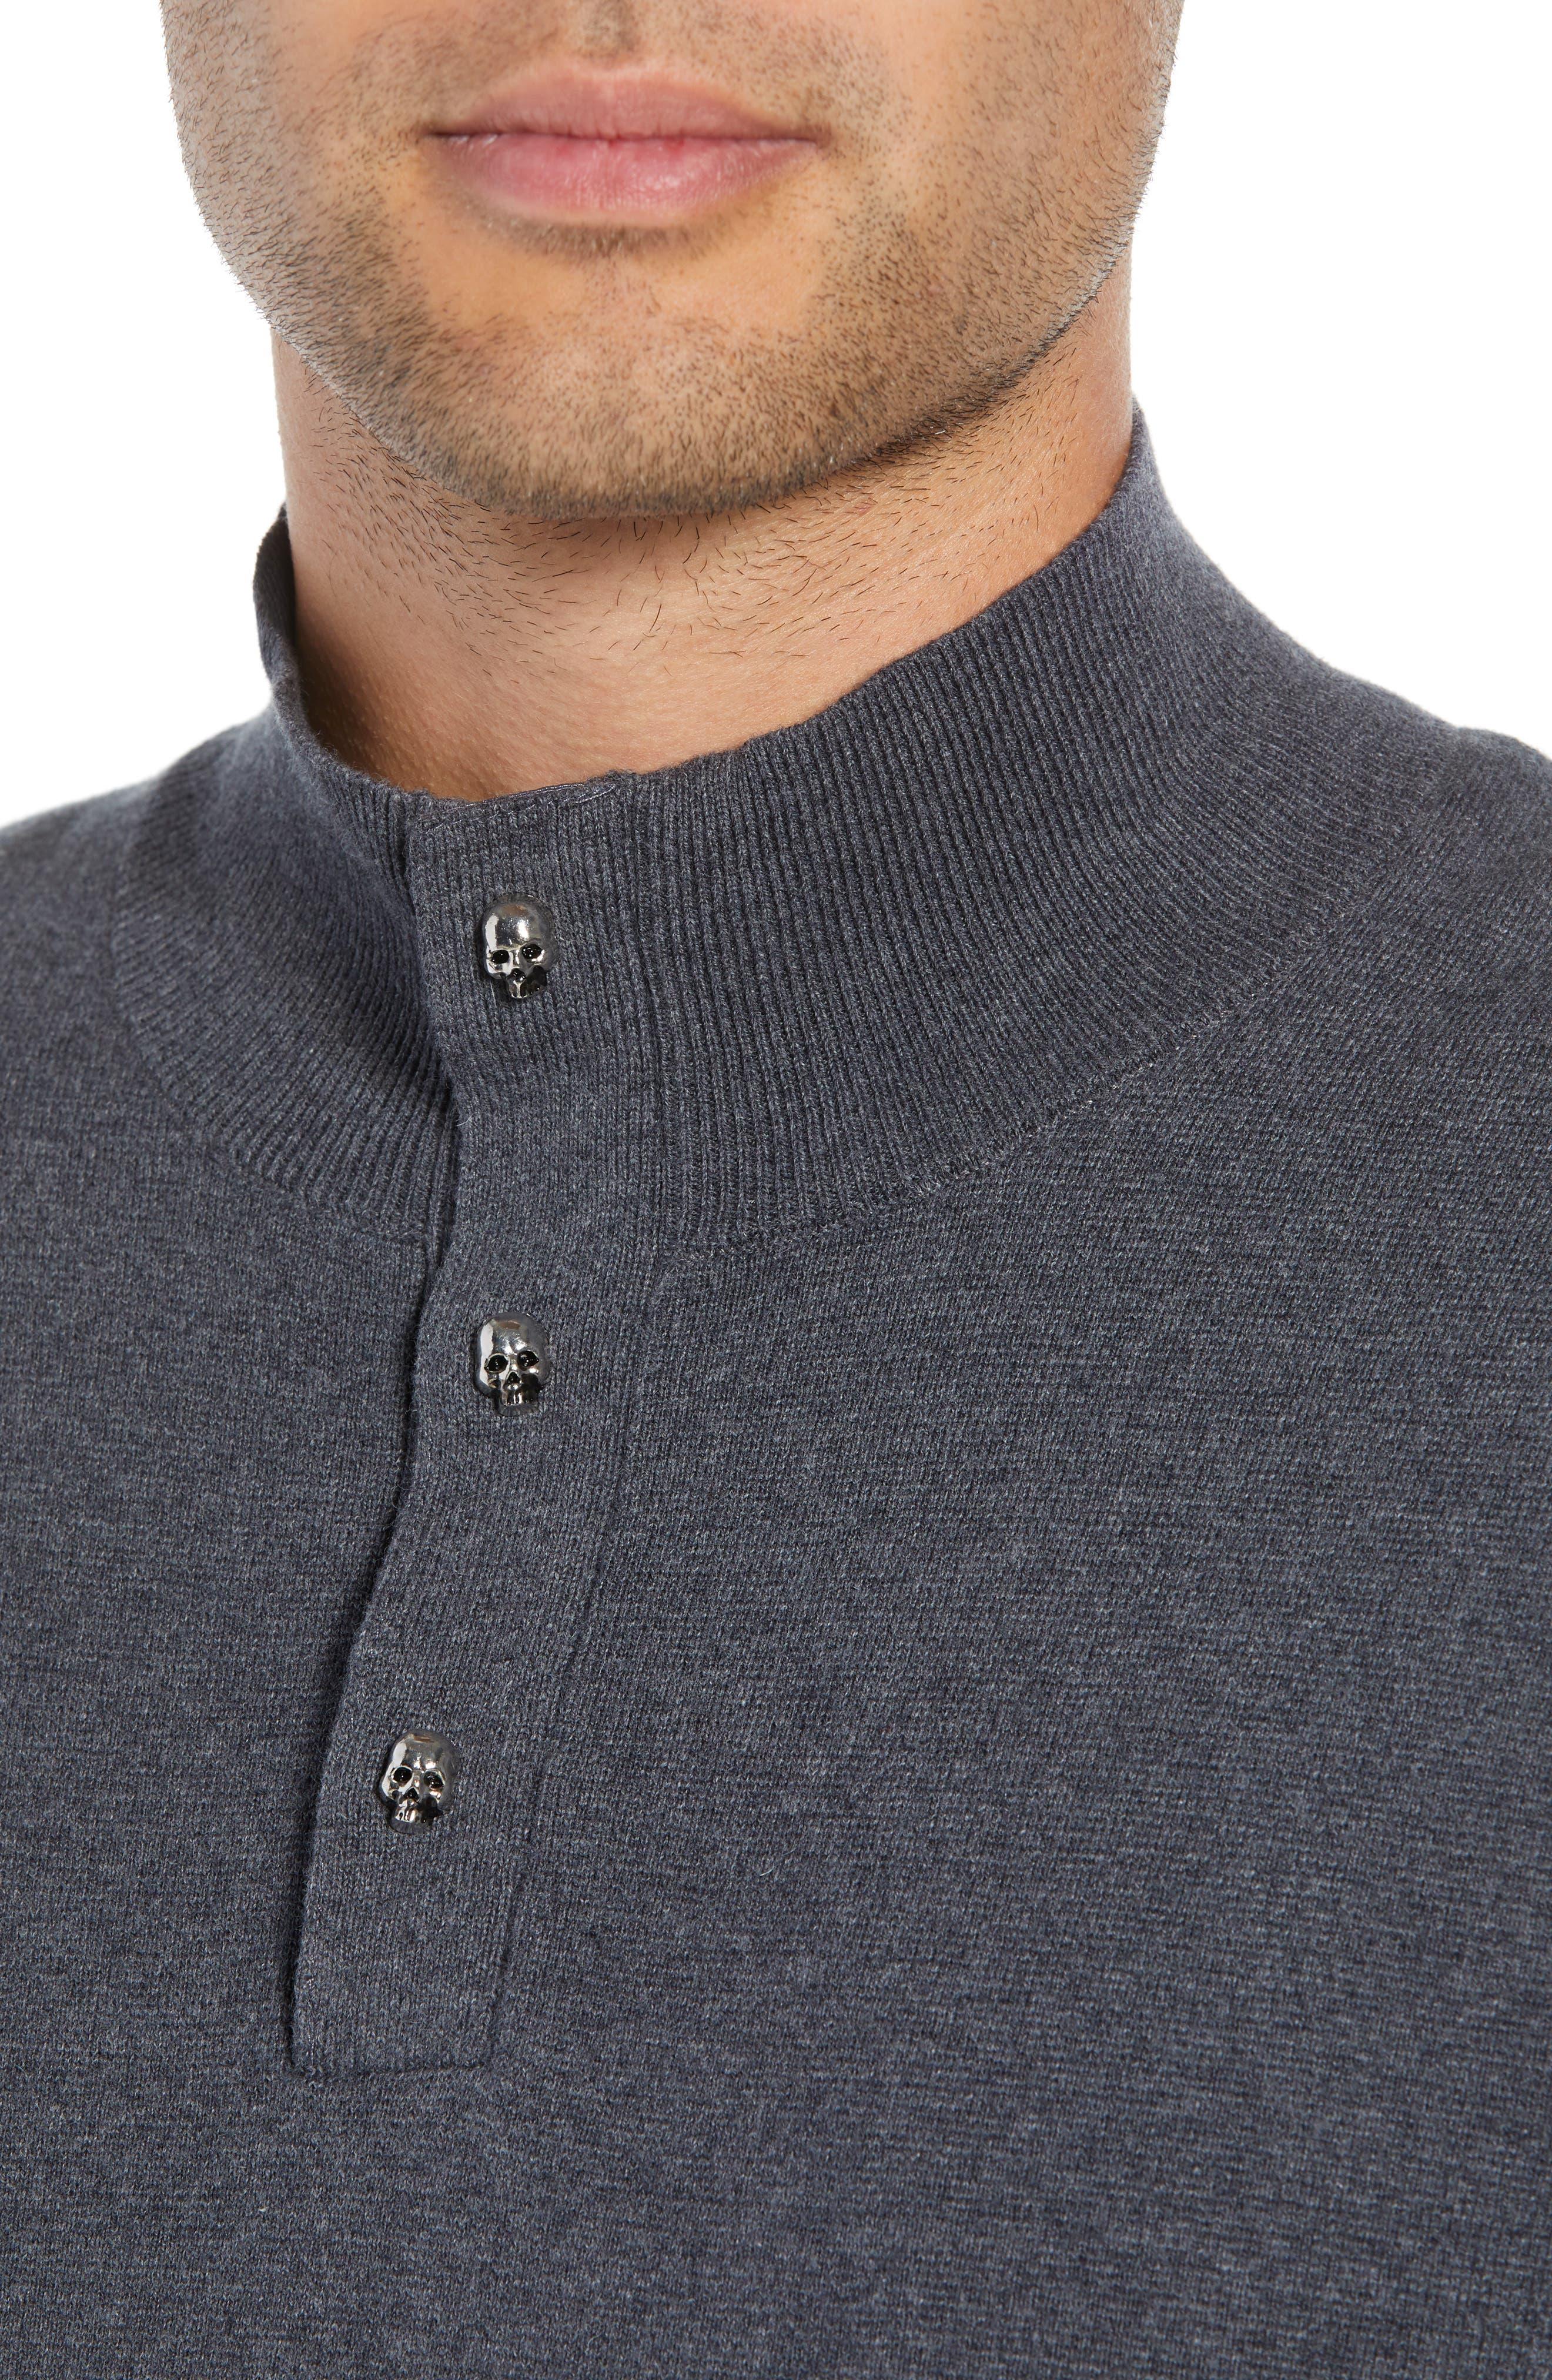 Classic Fit Skullhead Sweater,                             Alternate thumbnail 4, color,                             GREY